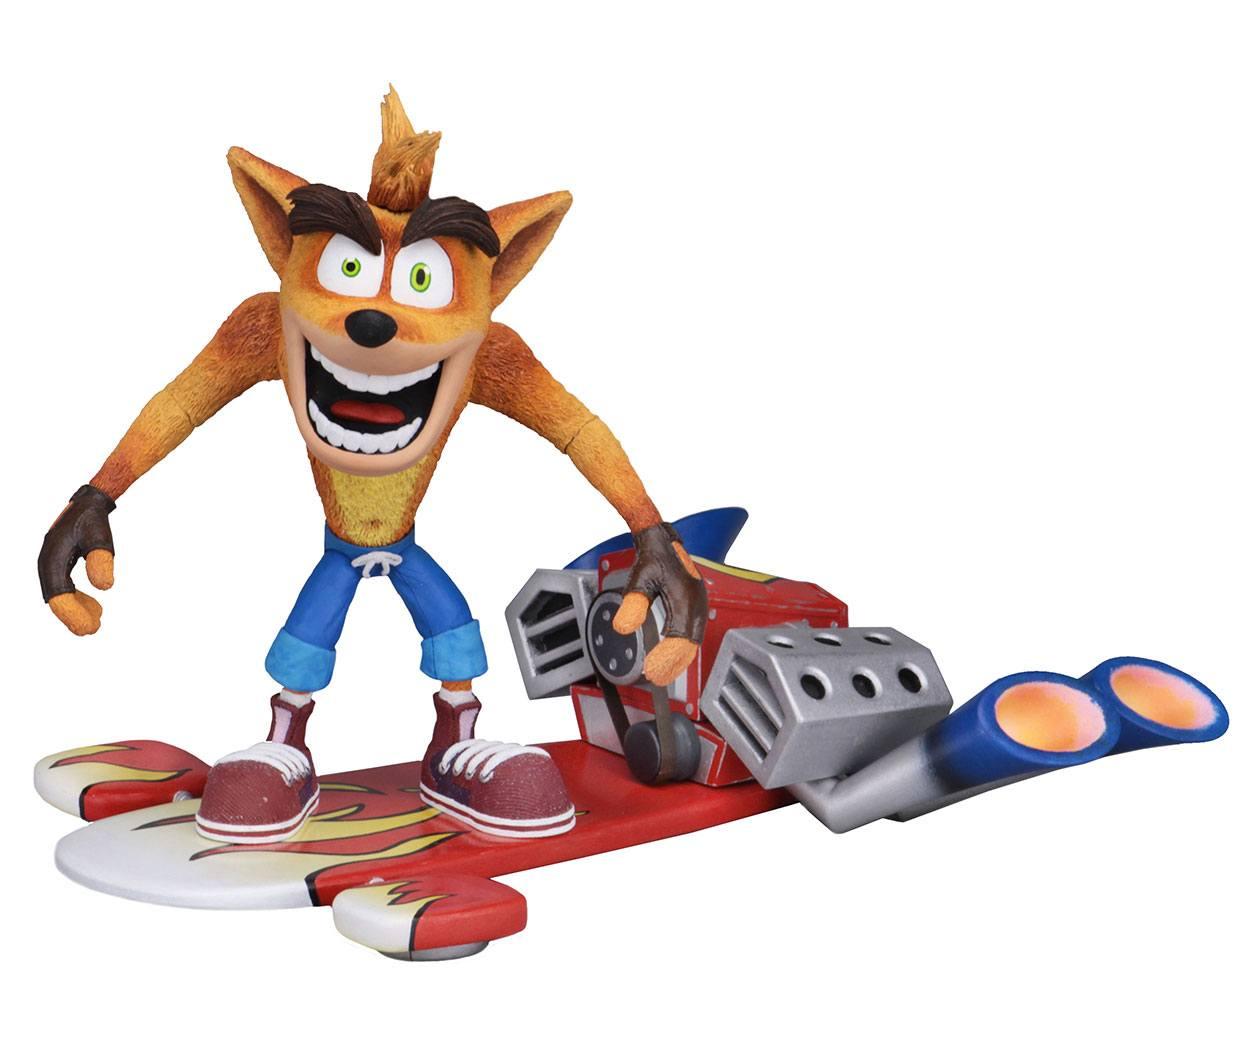 Crash Bandicoot Action Figure Deluxe Hoverboard Crash Bandicoot 14 cm